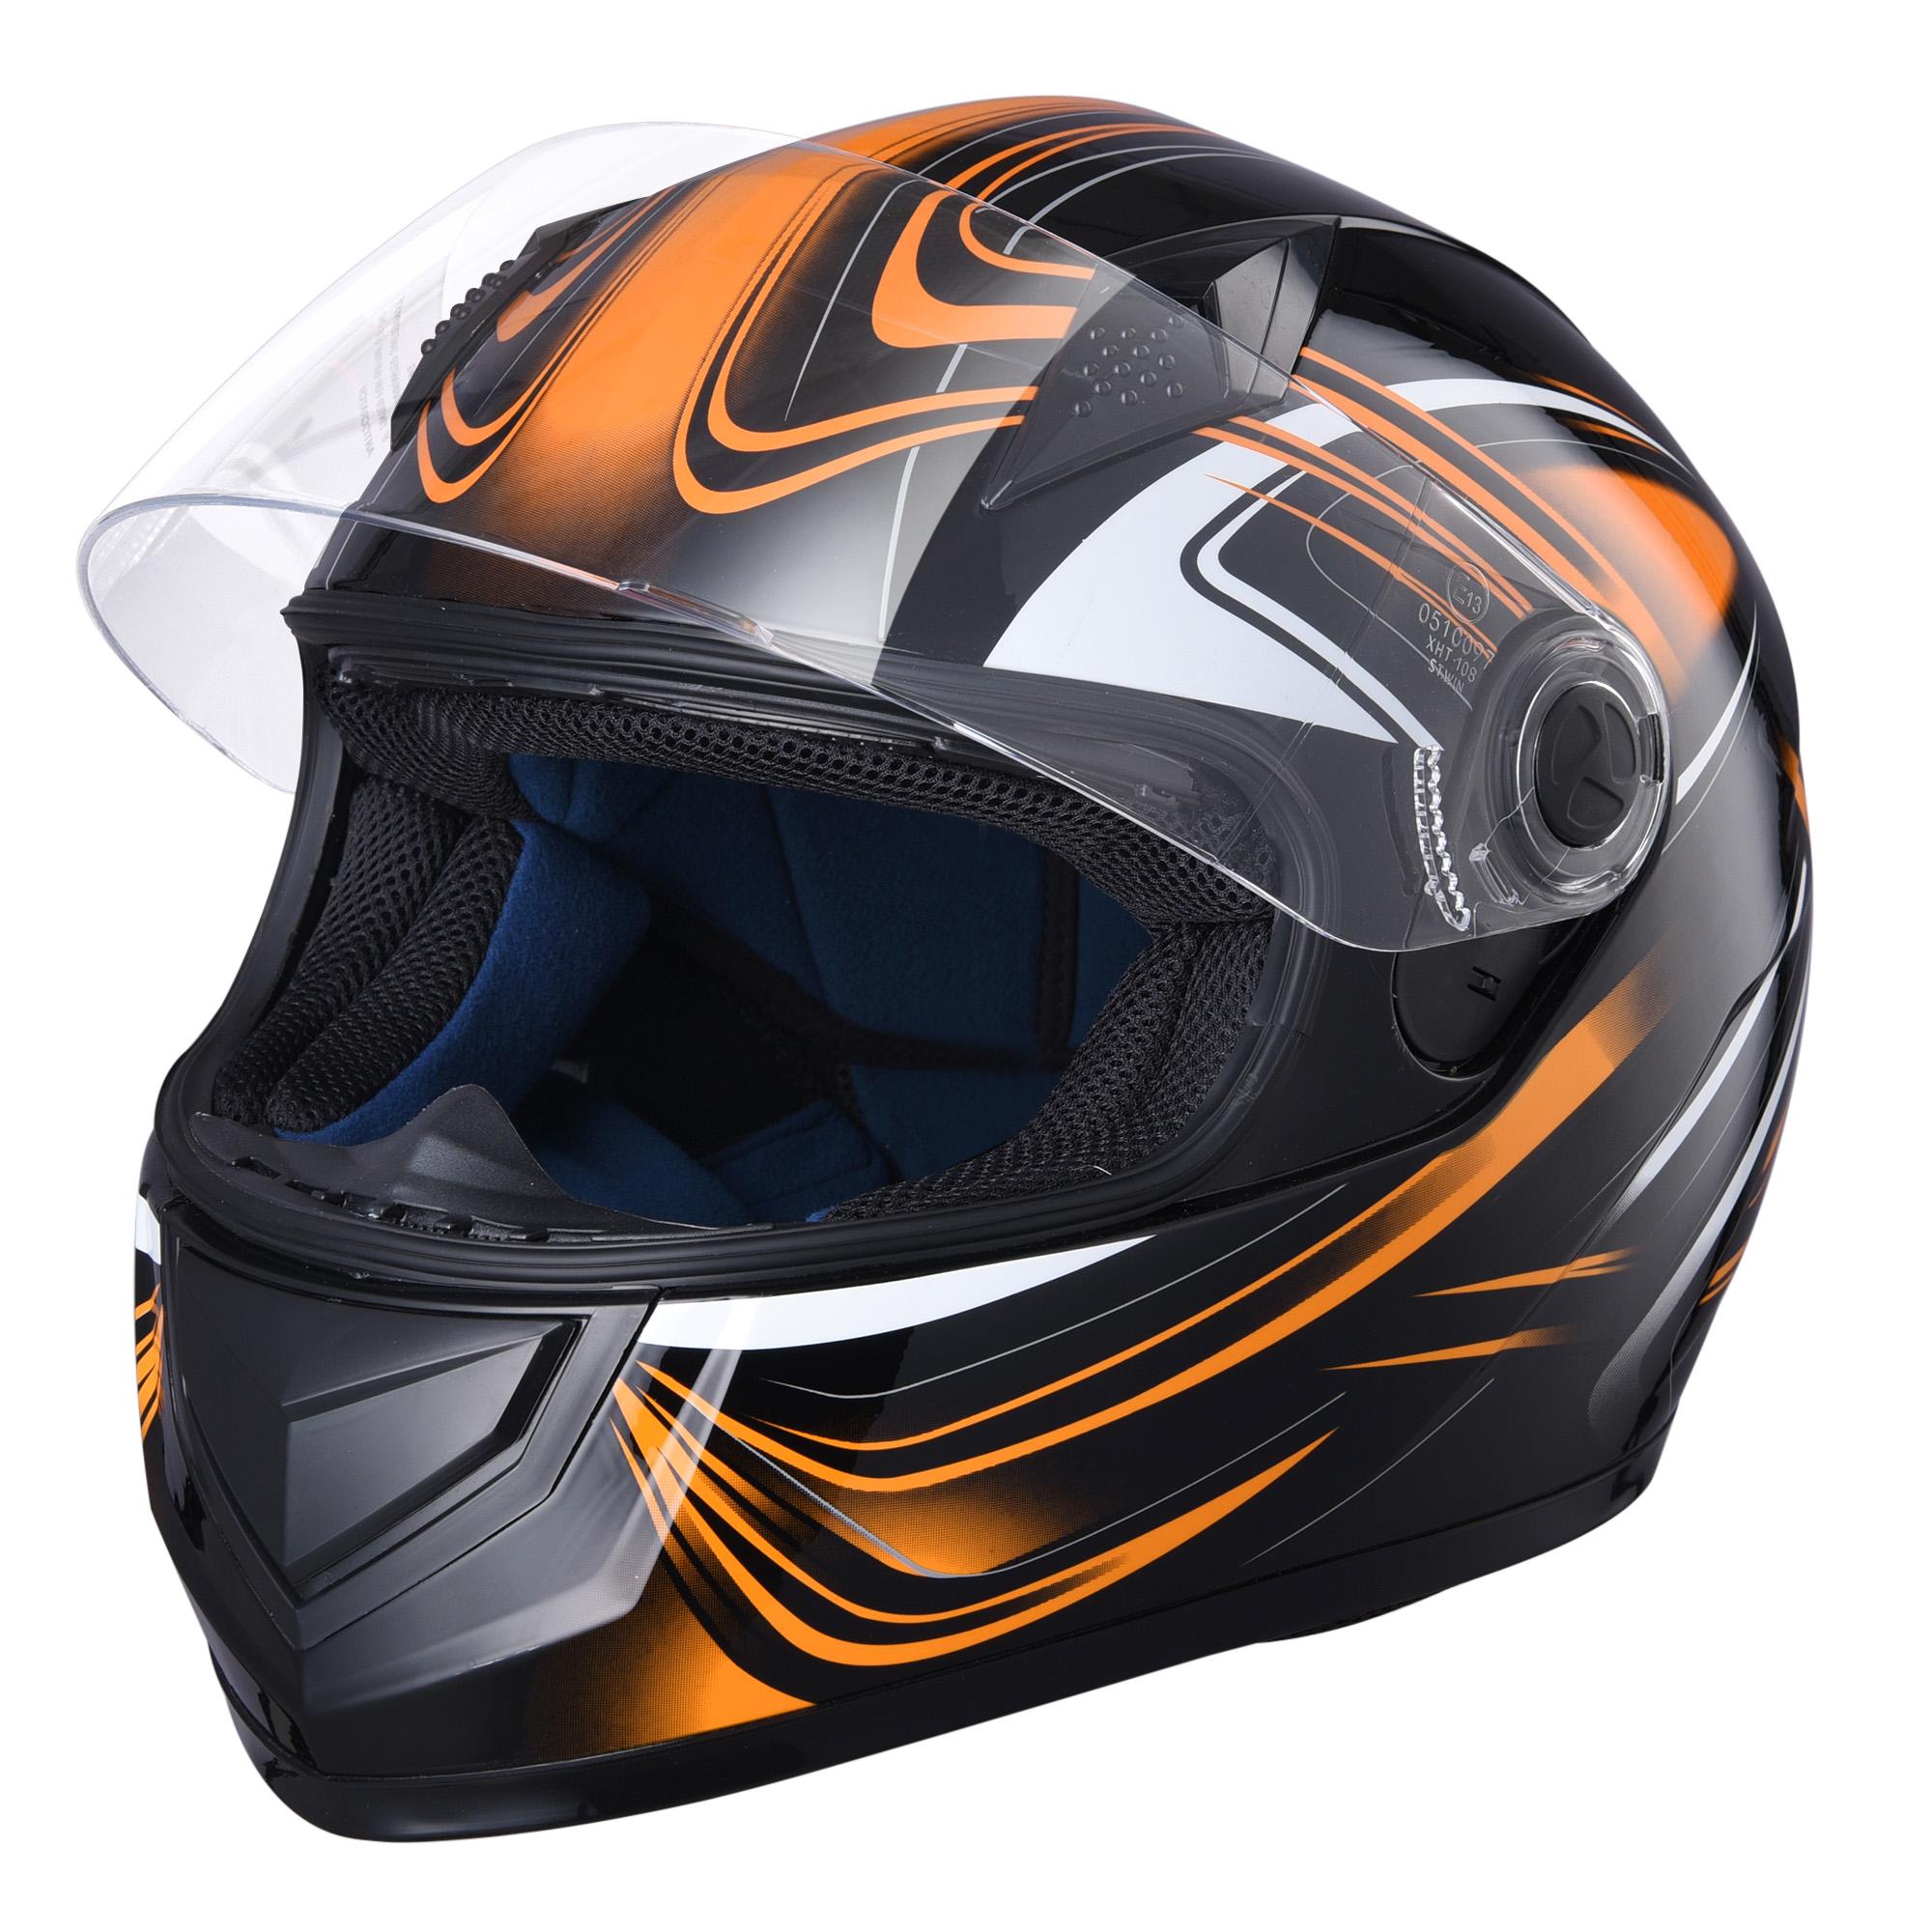 miniature 74 - AHR K12 Full Face Motorcycle Helmet DOT Air Vents Clear Visor Racing S M L XL